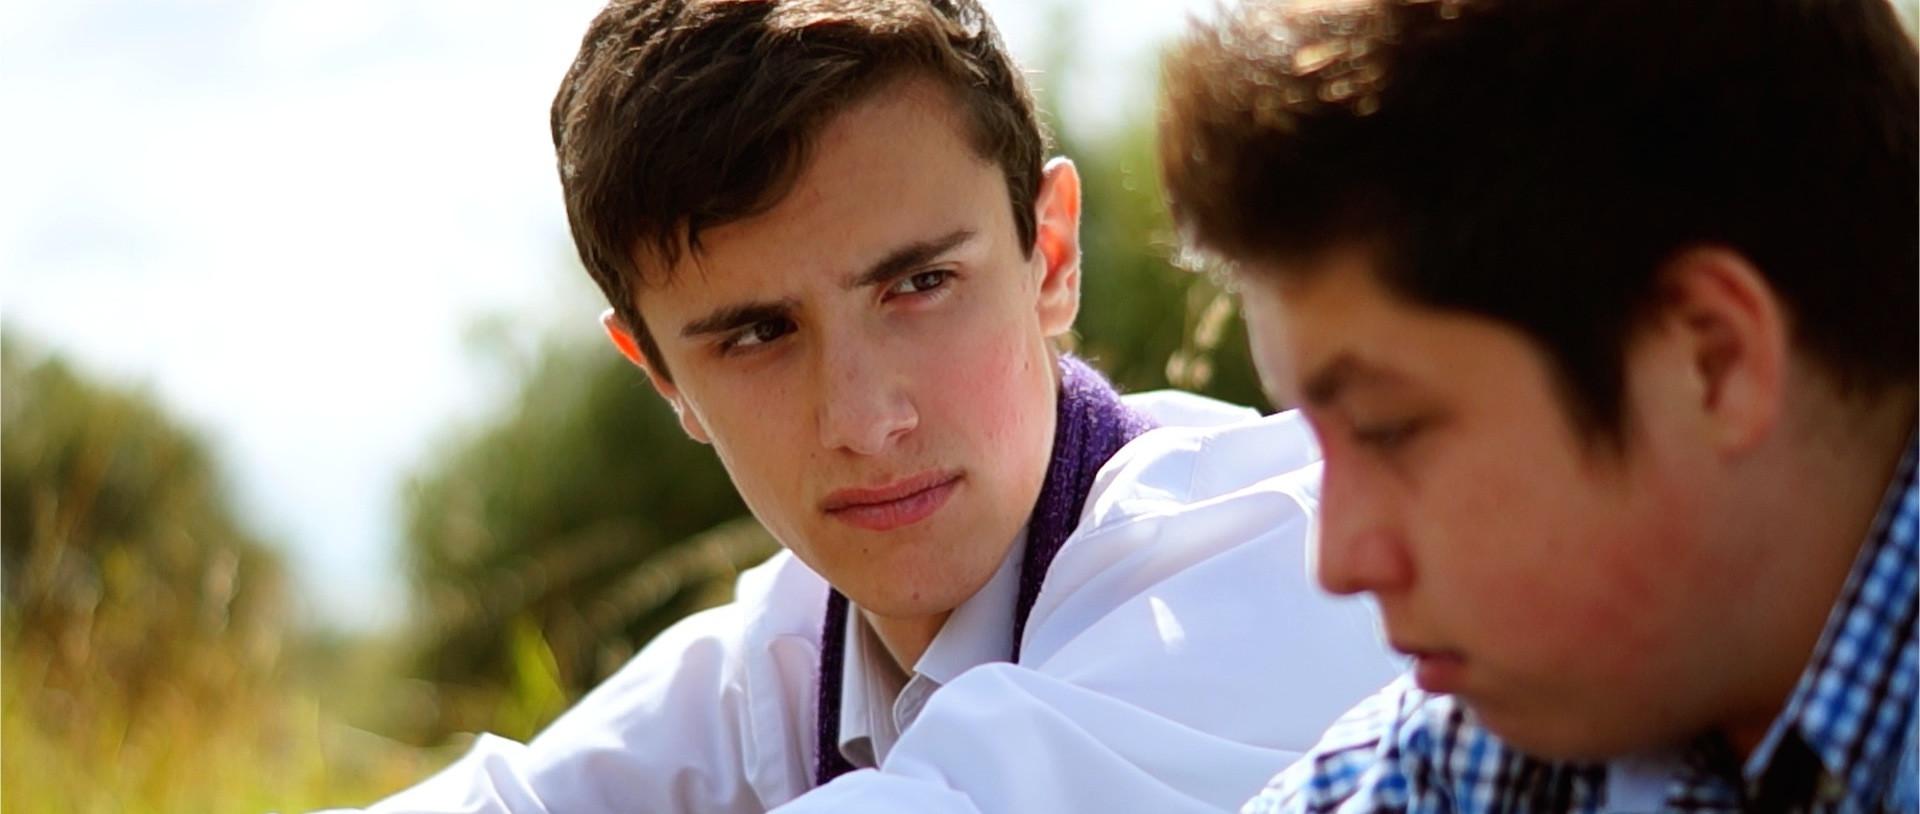 Jordan Cottle as Hugh Darvill